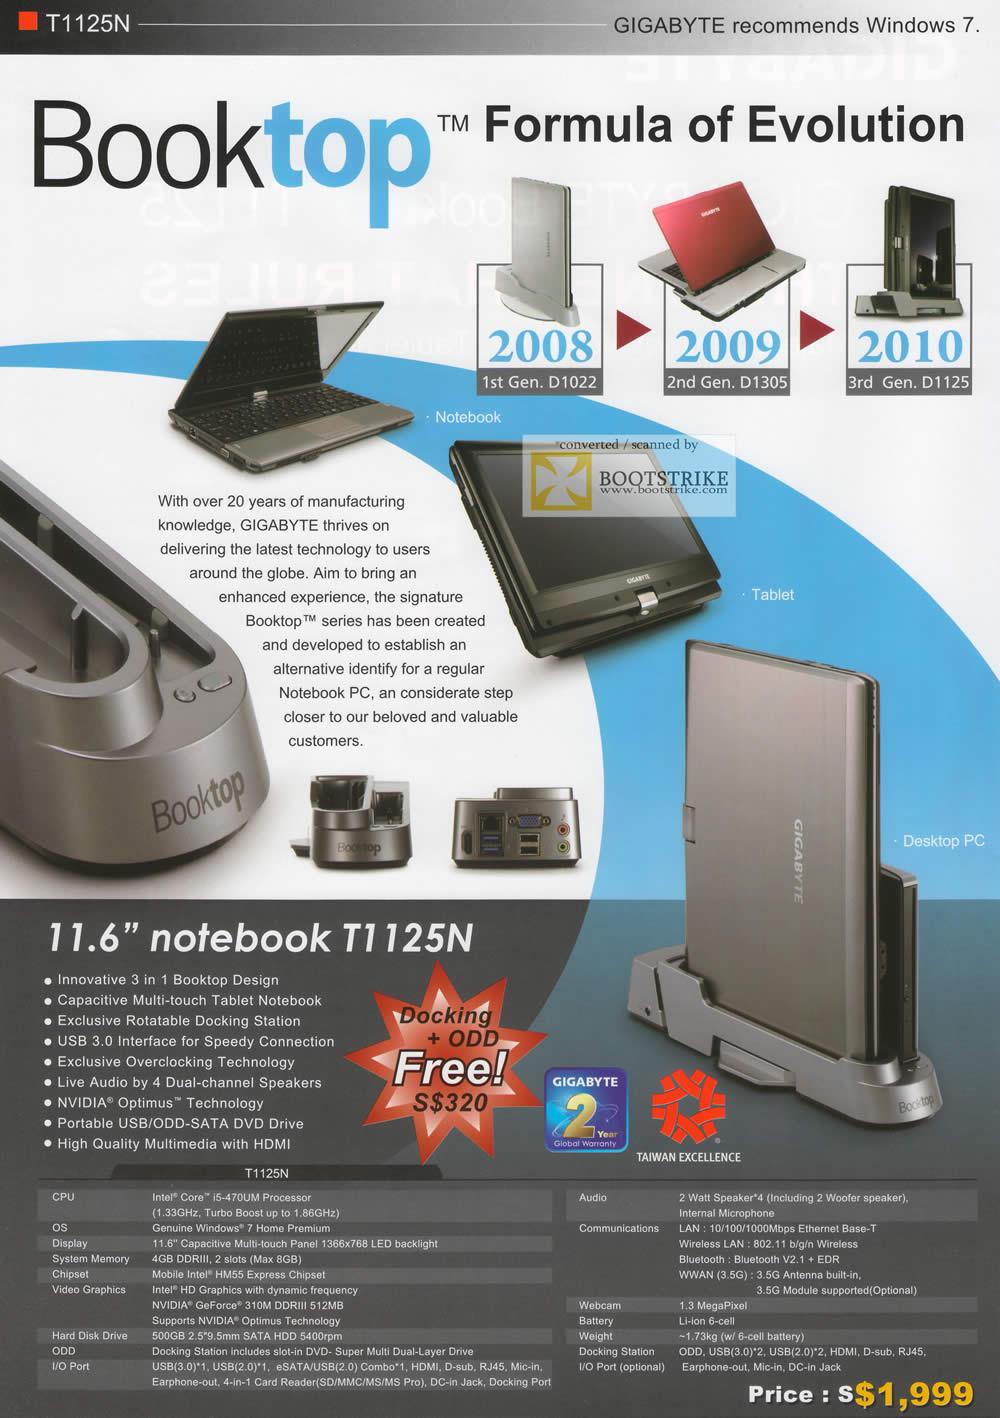 IT Show 2011 price list image brochure of Digital Asia Gigabyte Notebooks Booktop T1125N